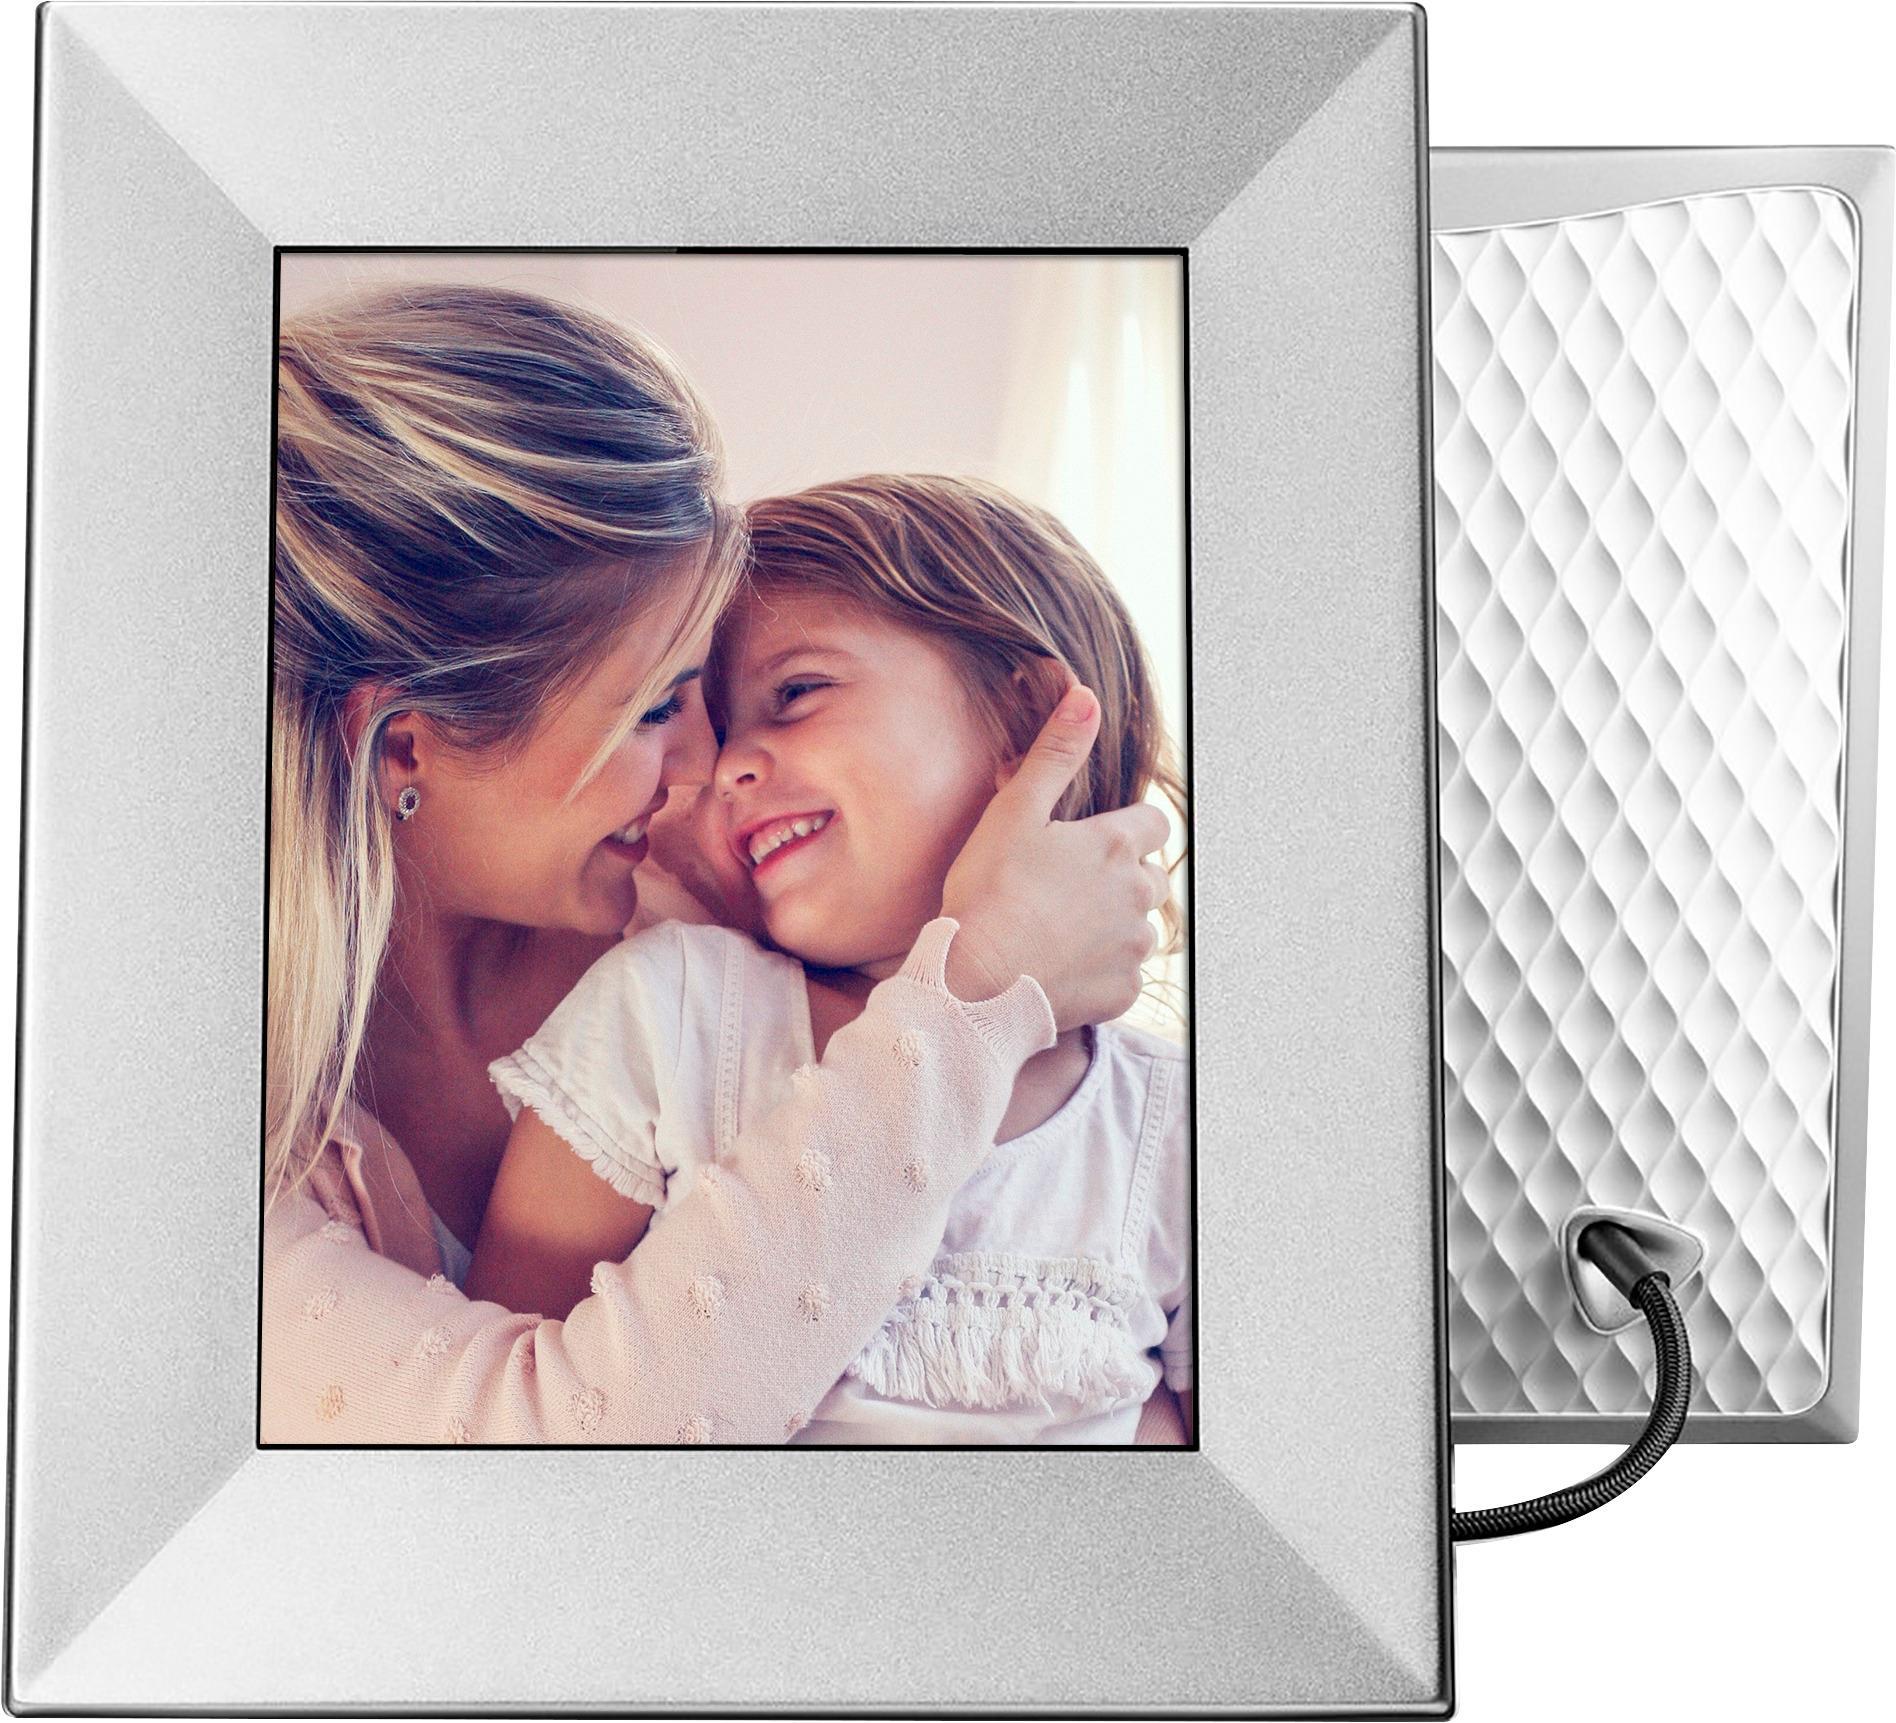 nixplay iris 8 lcd wi fi digital photo frame silver